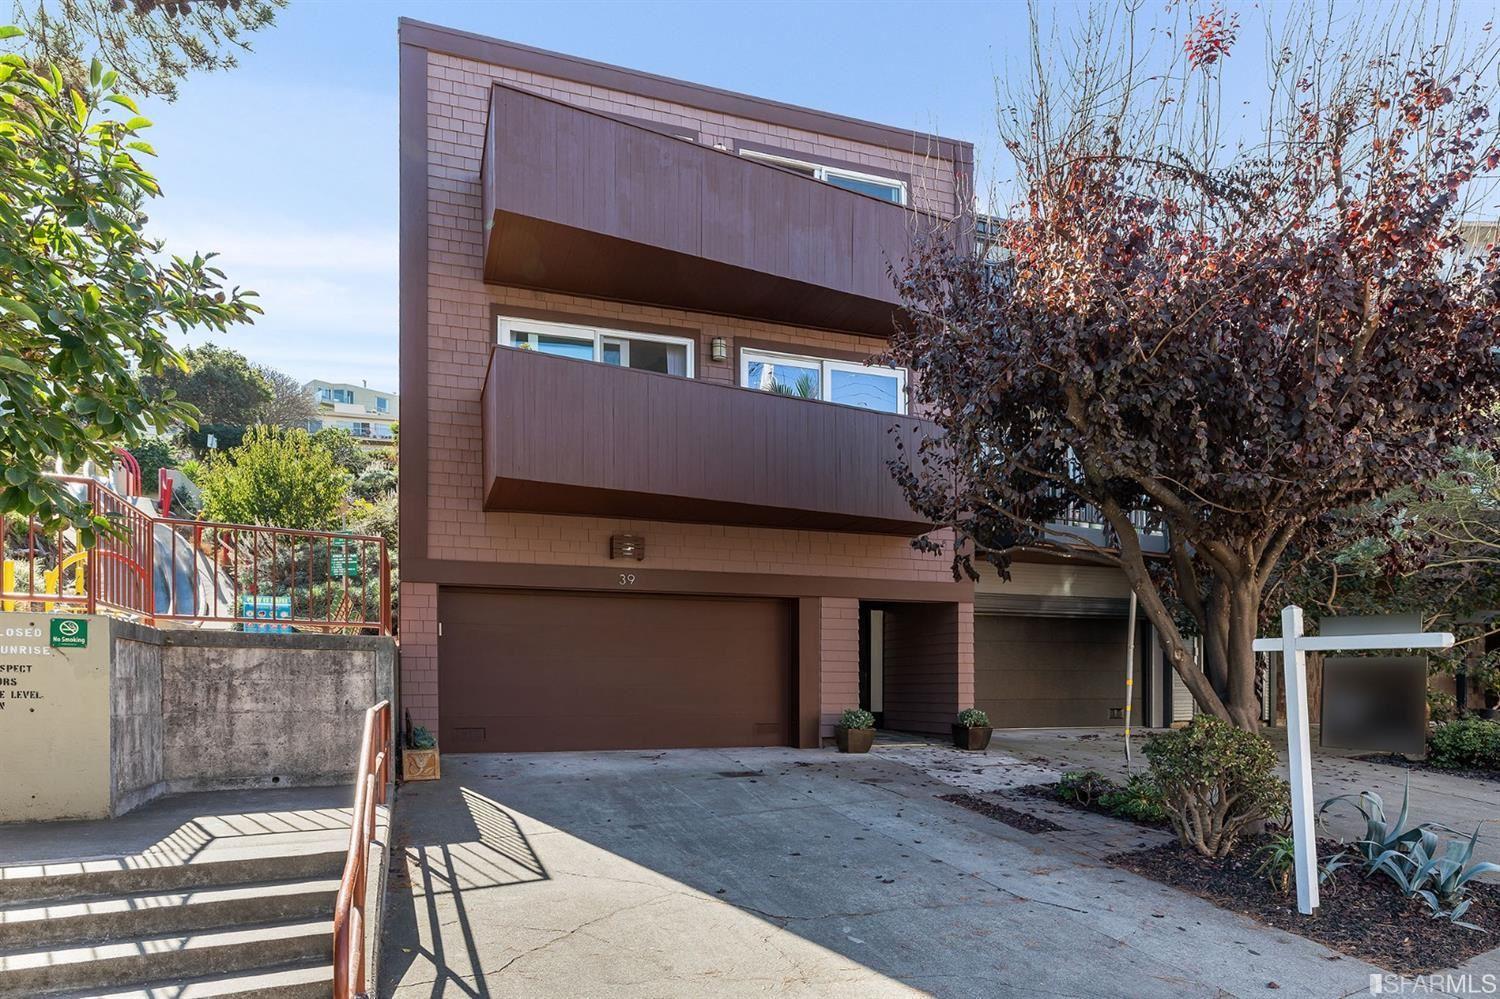 39 Seward Street, San Francisco, CA 94114 - #: 506451